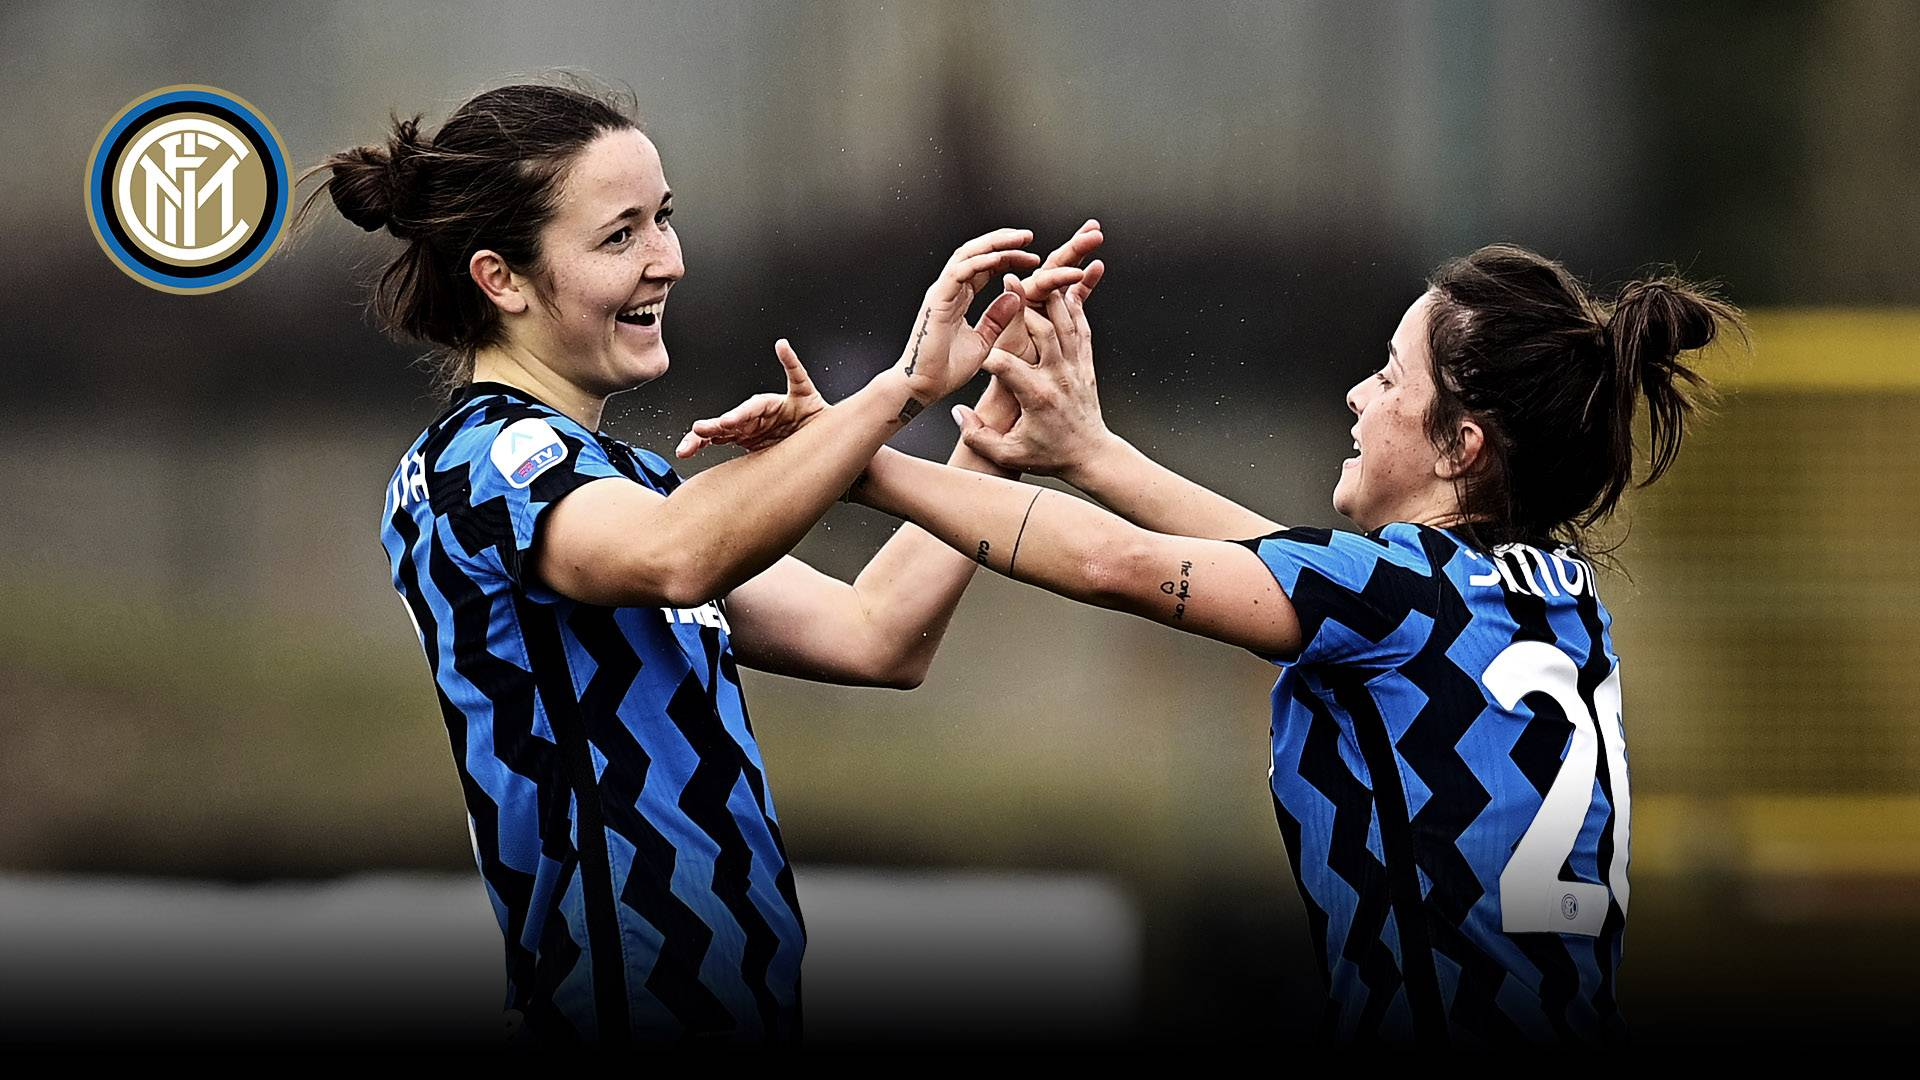 Watch Inter TV - Coppa Italia femminile: Fiorentina - Inter Online